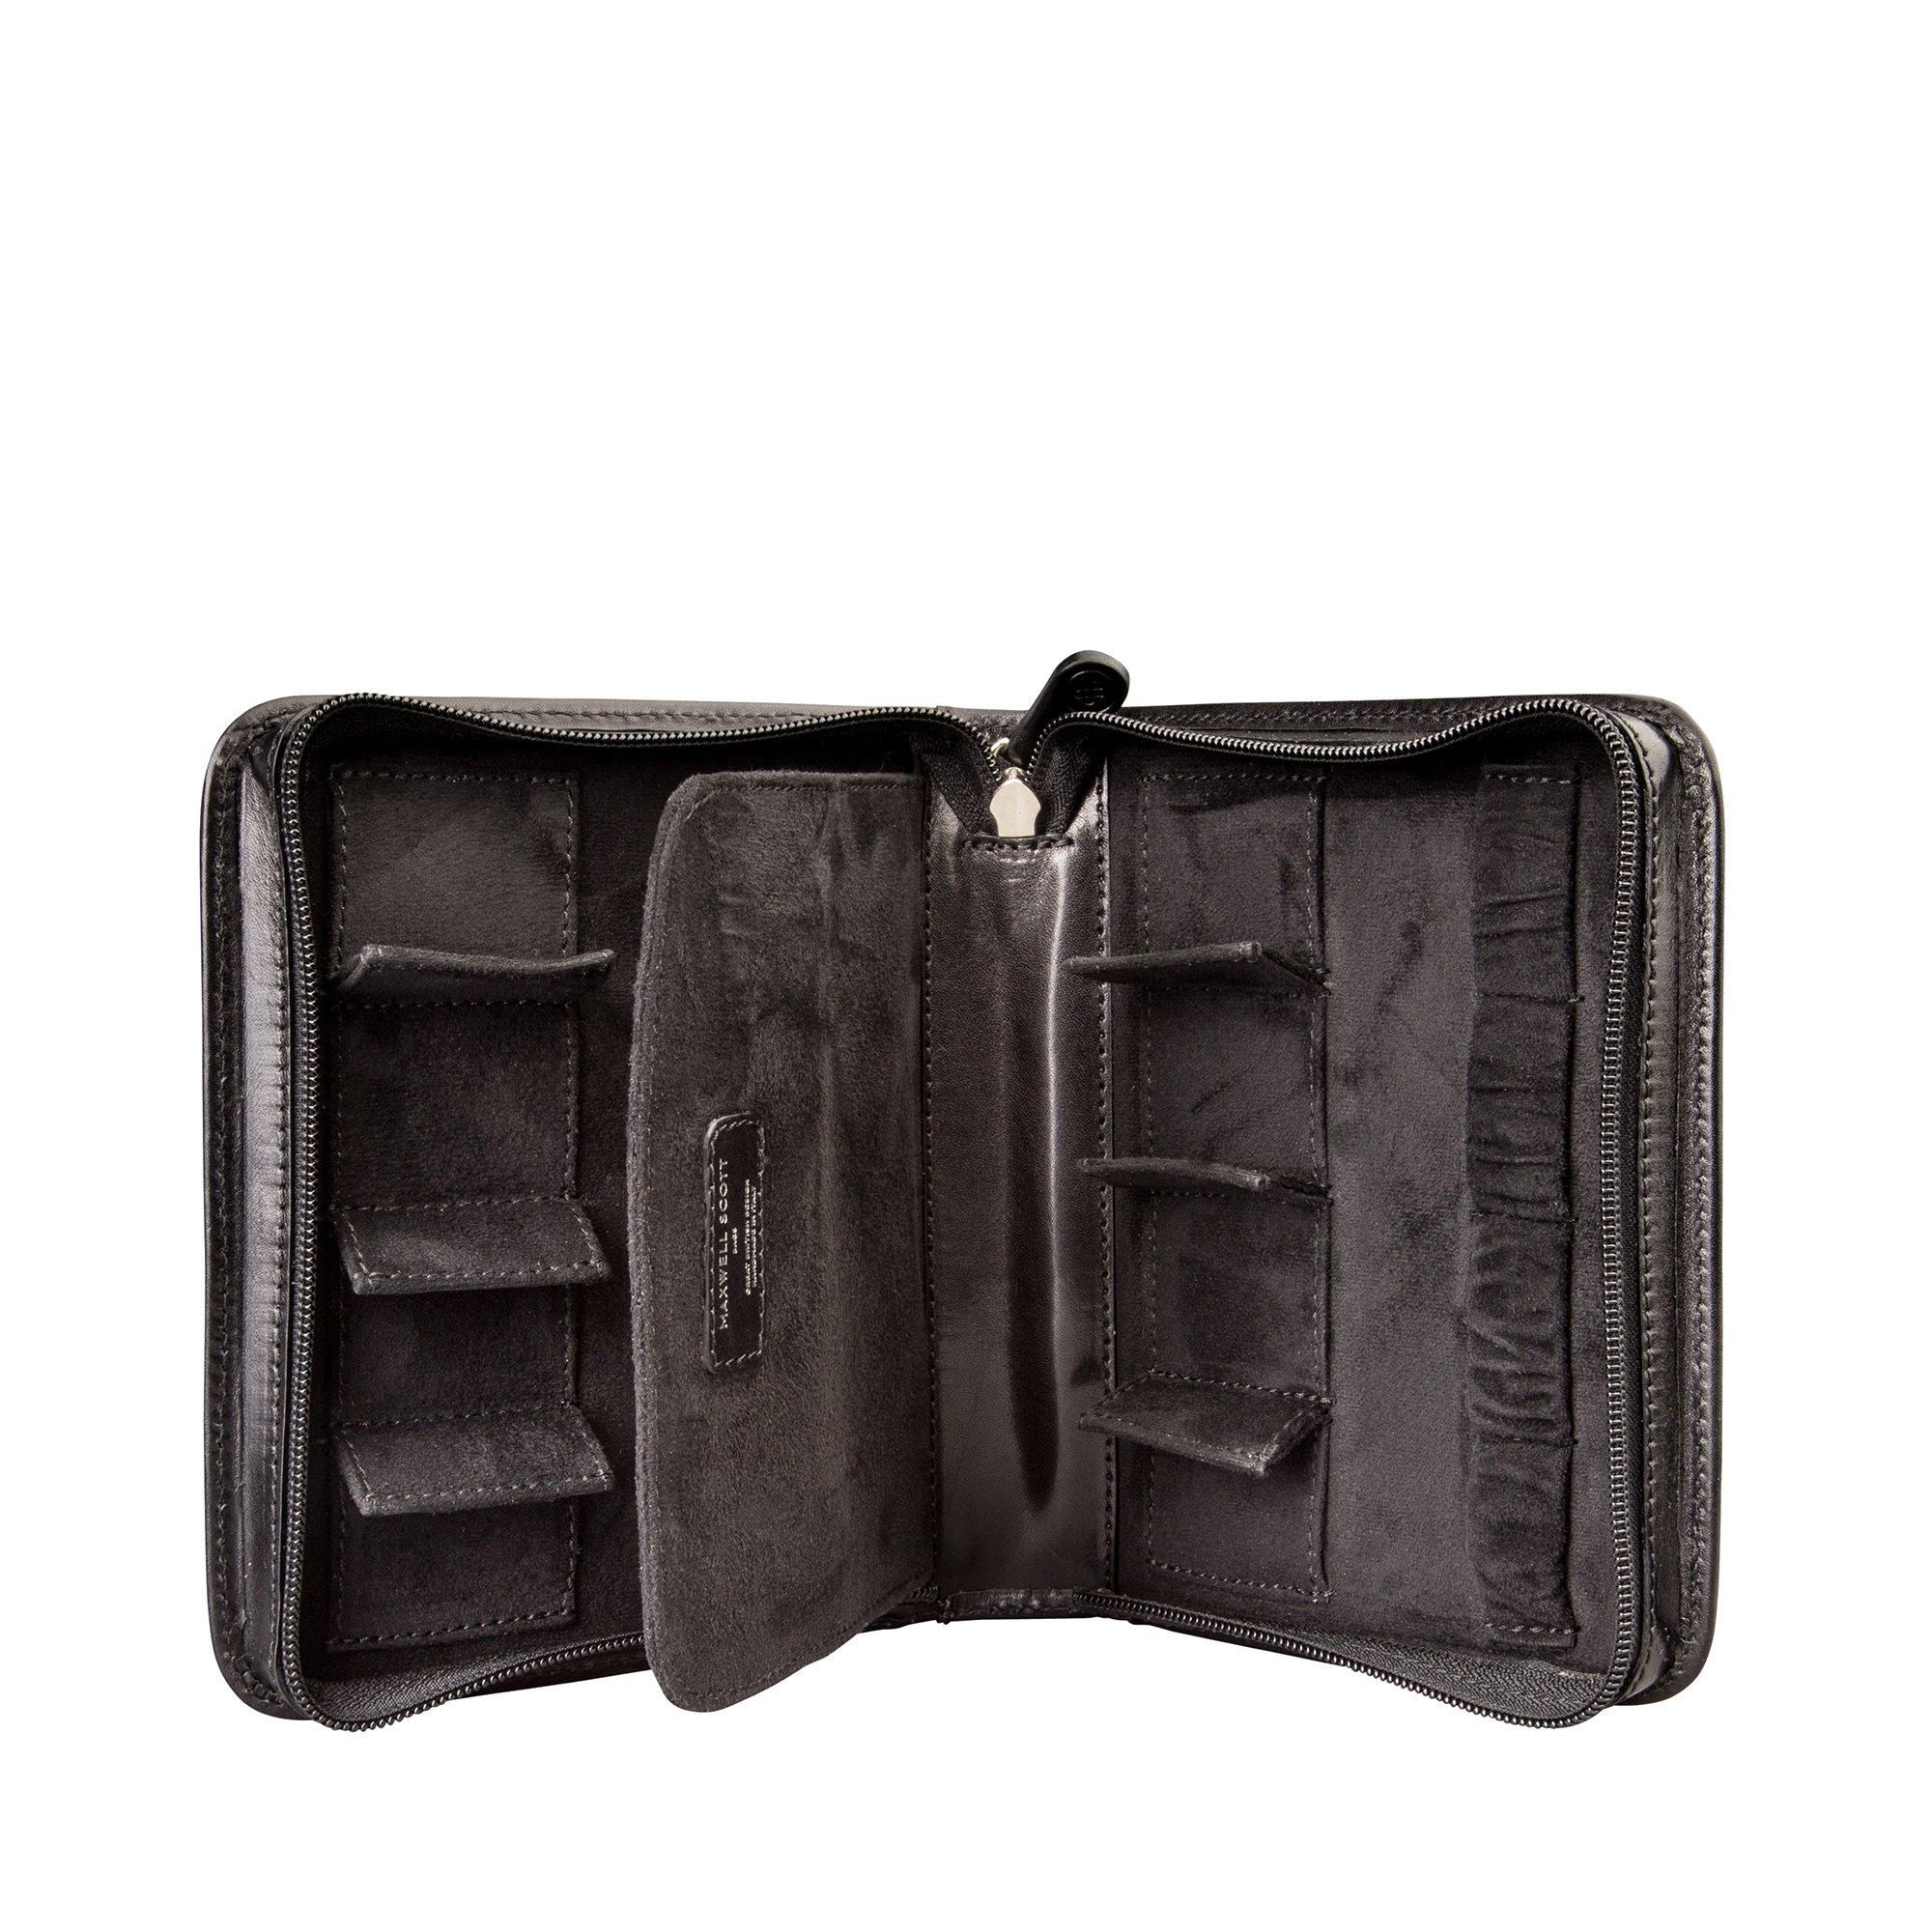 Maxwell Scott Luxury Black Leather Watch Carrying Case (Atella)